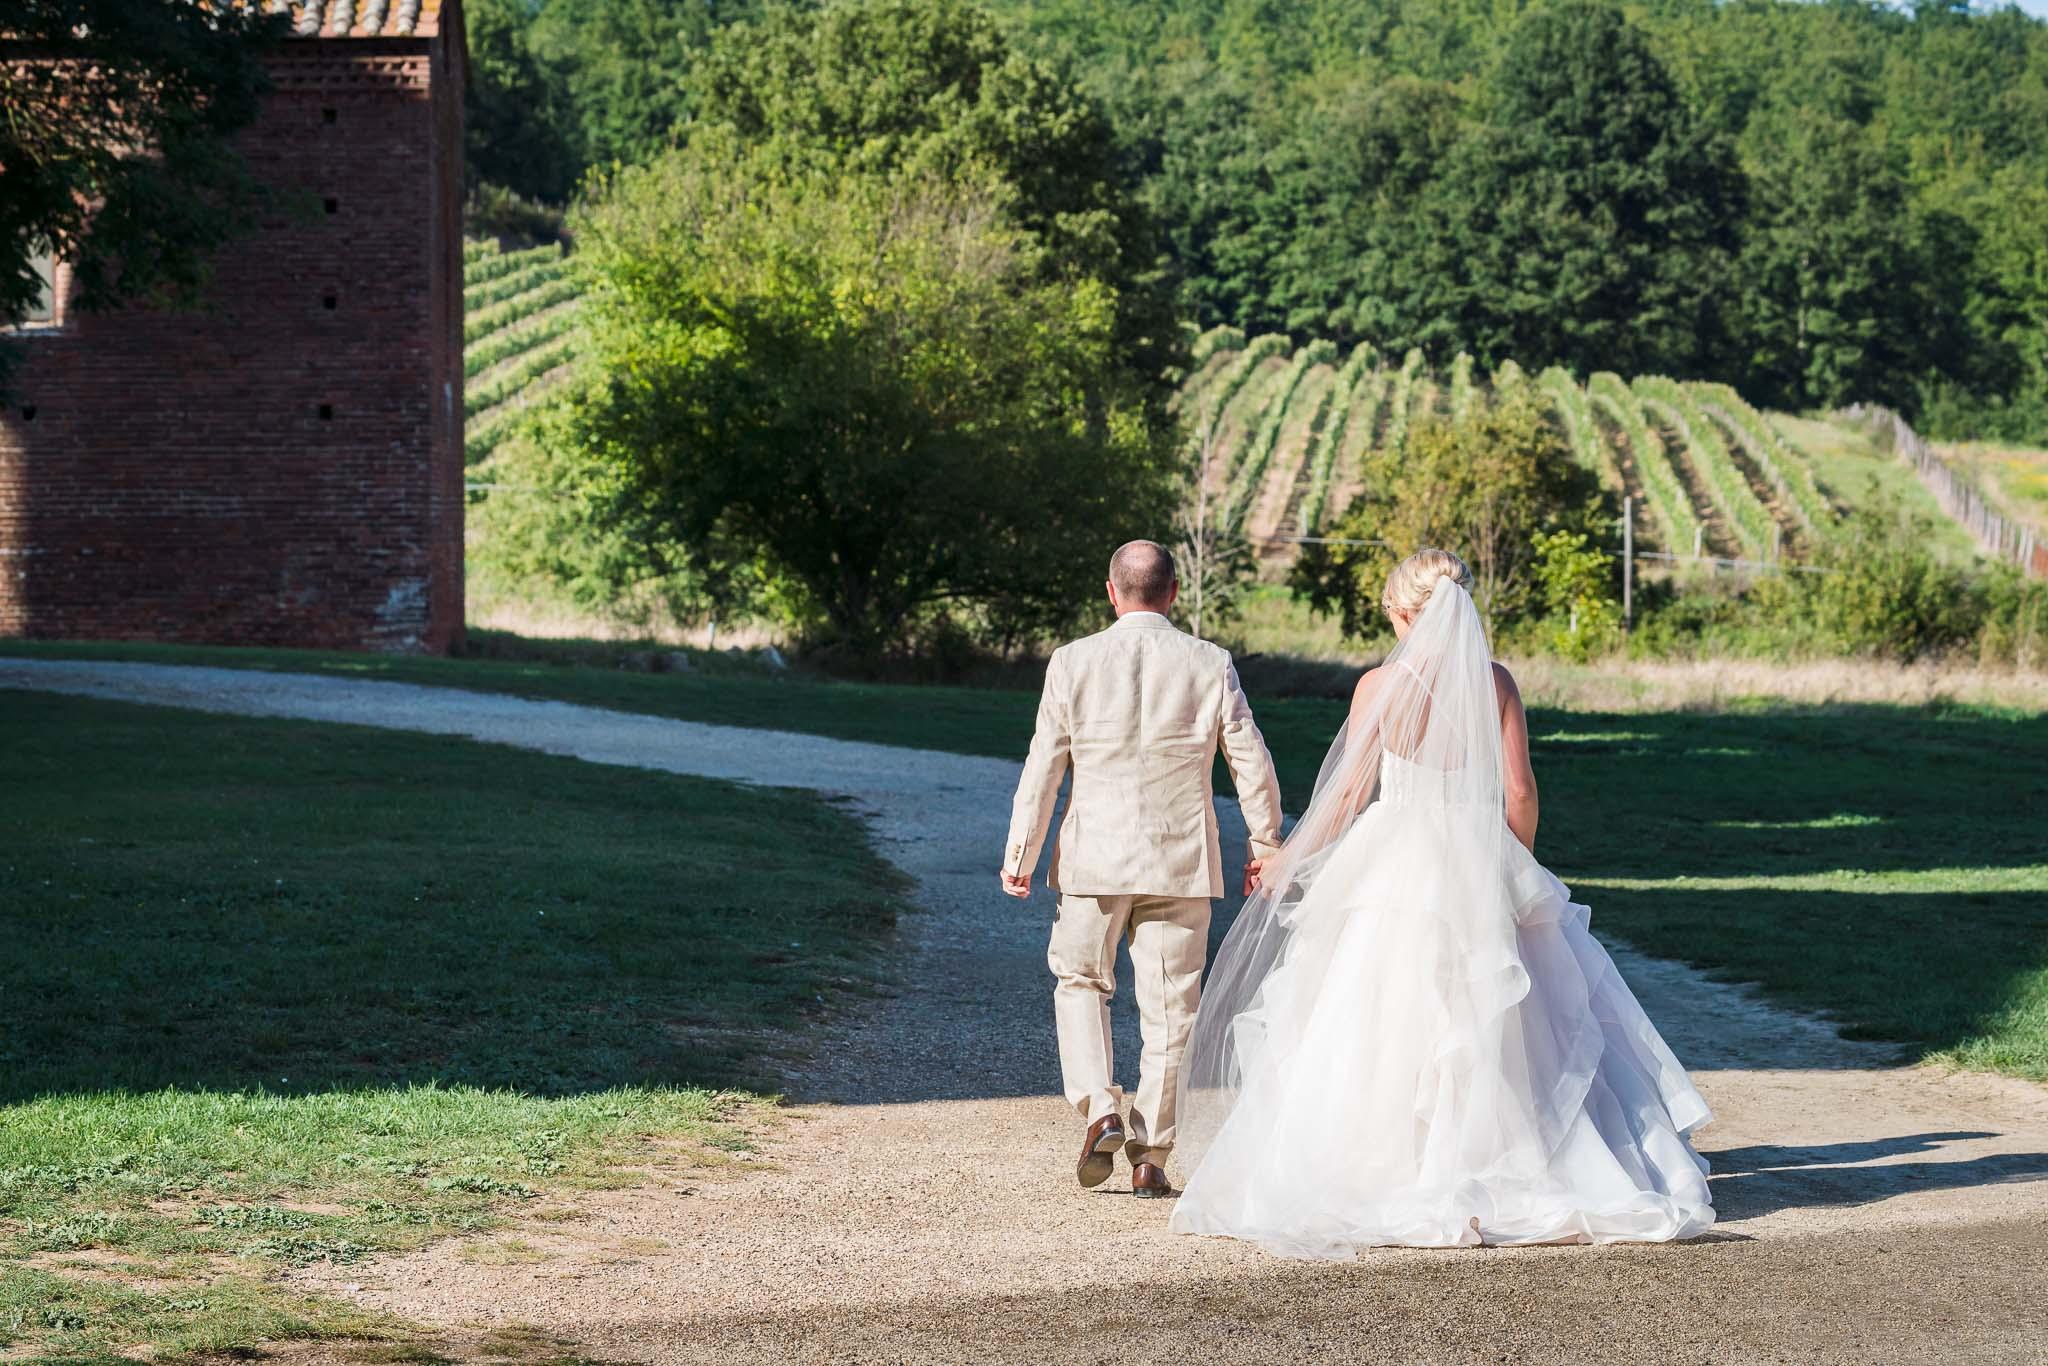 NC-2018-09-07_gemma-and-steve-wedding-1539.jpg